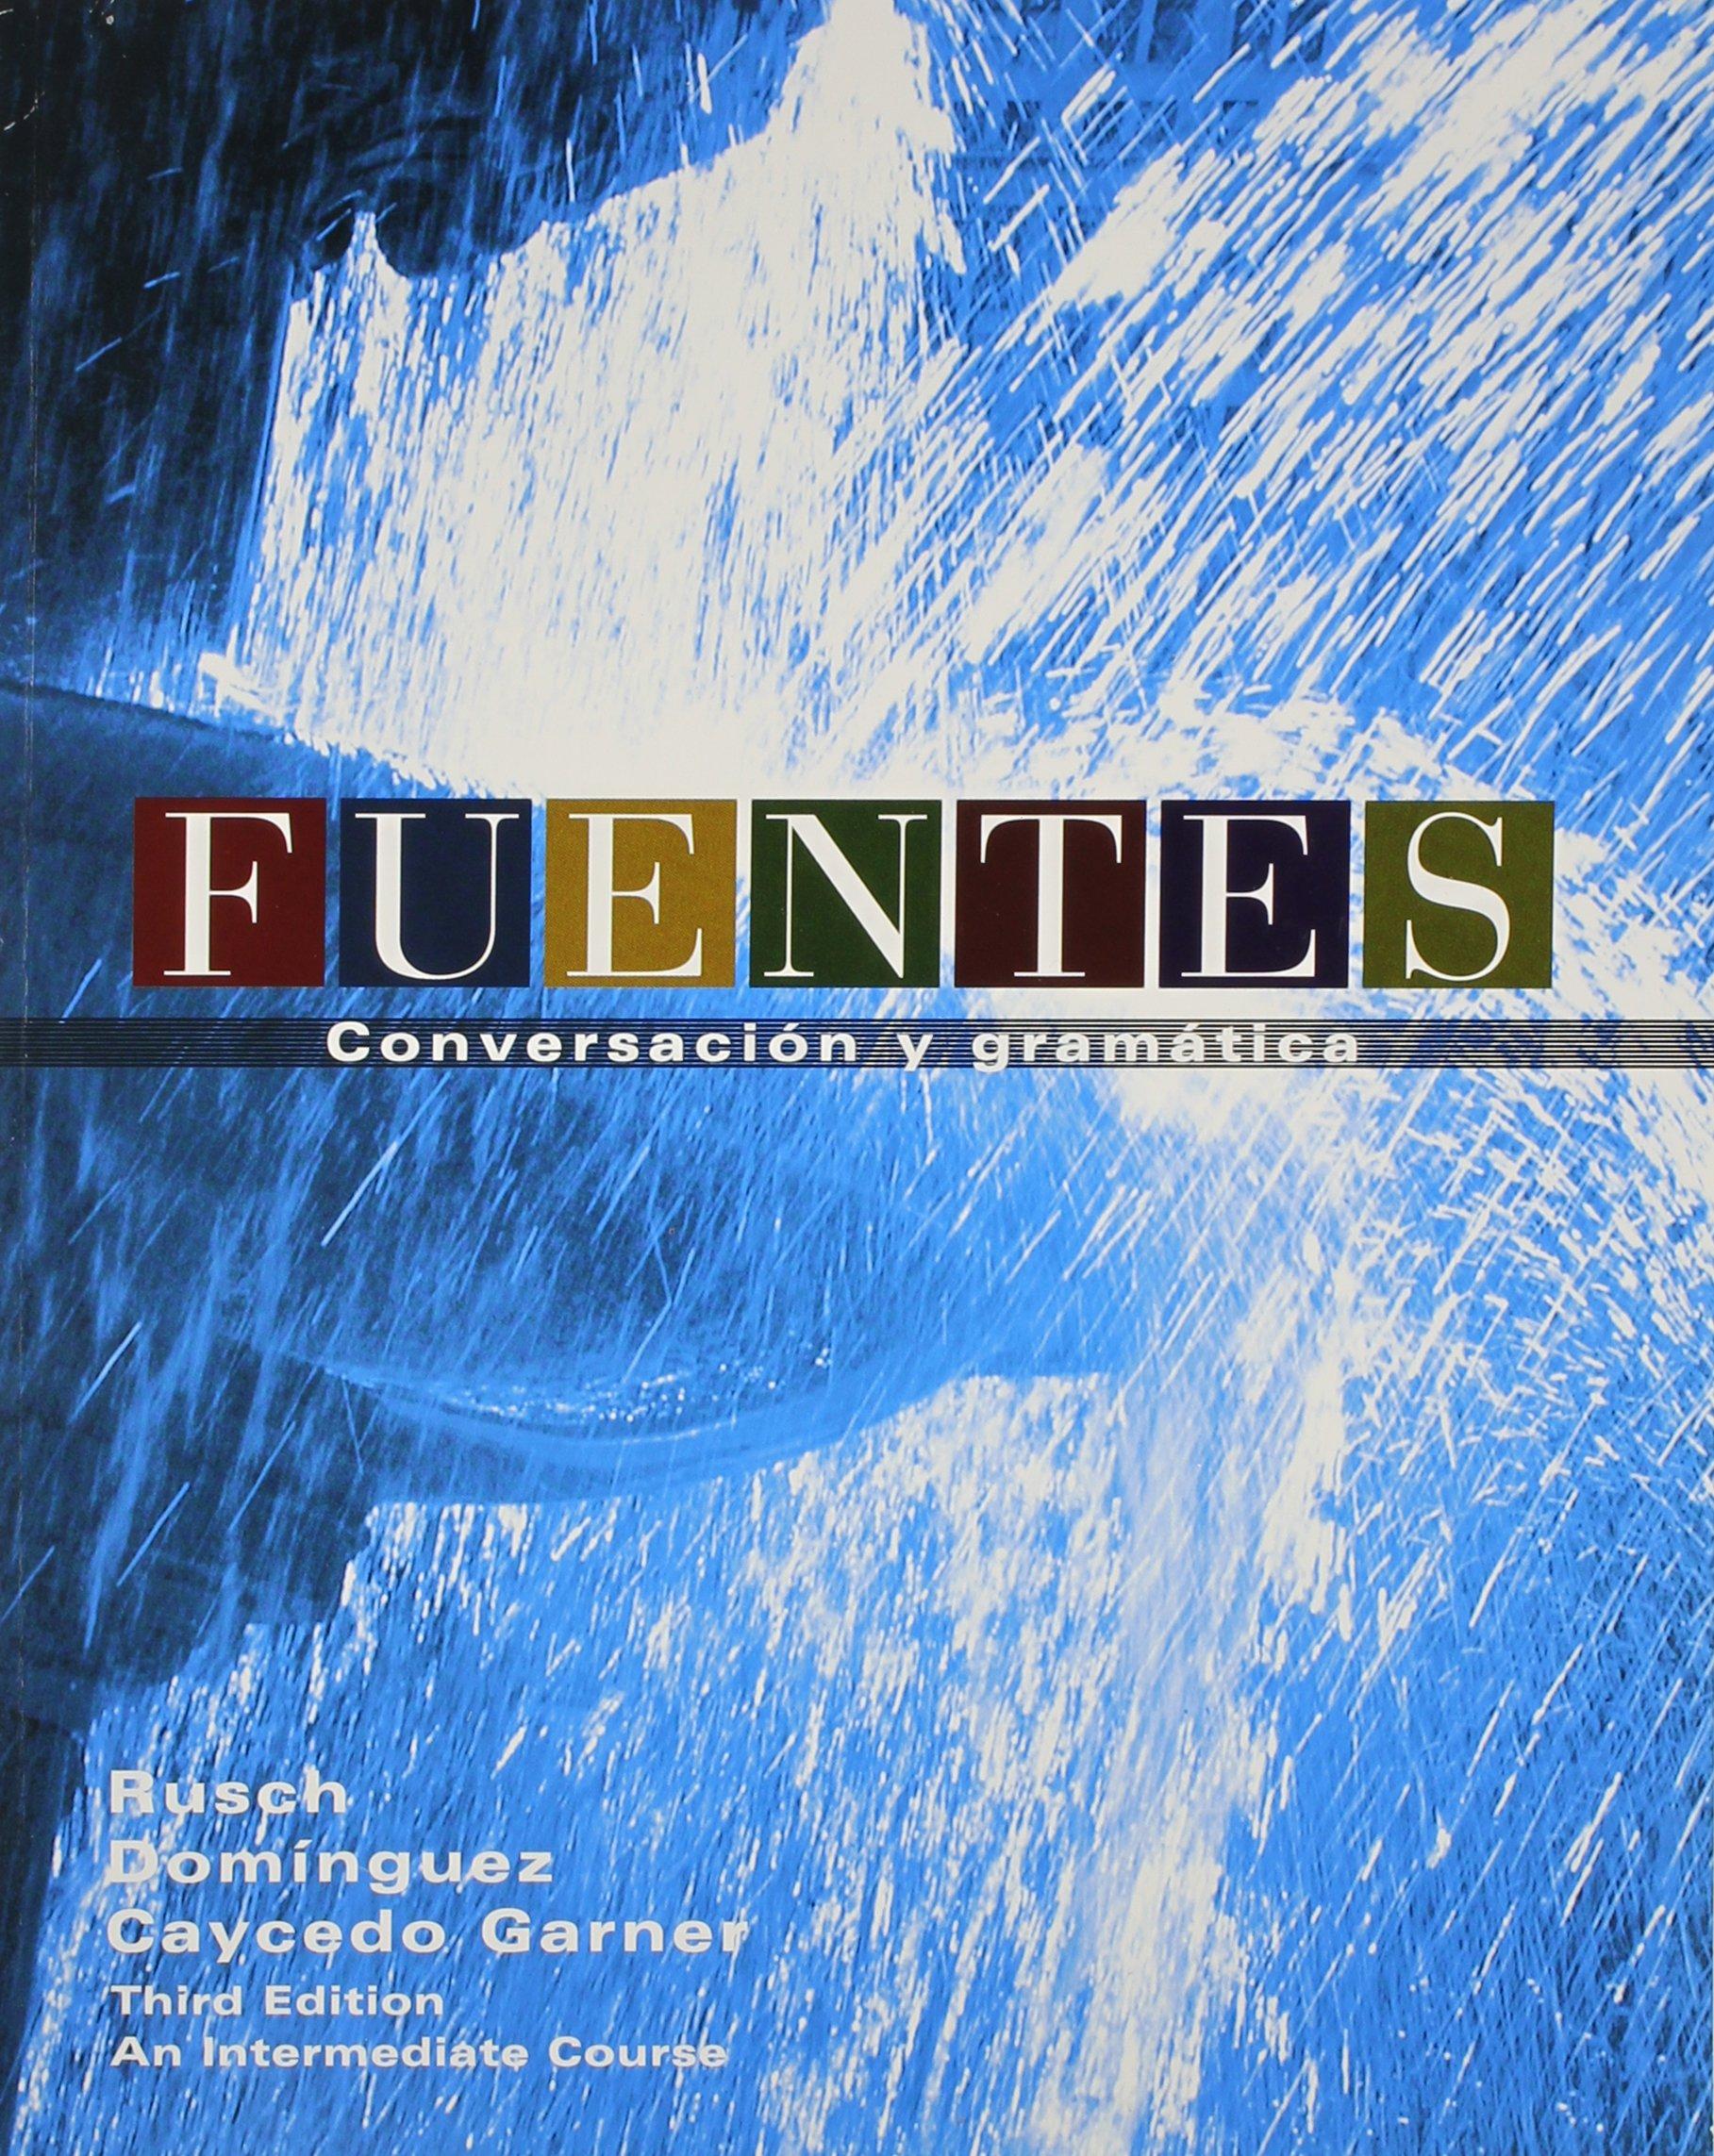 Fuentes - Conversacion Textbook + Cd + Workbook + Answer Key + Textbook:  Amazon.ca: Debbie Rusch: Books